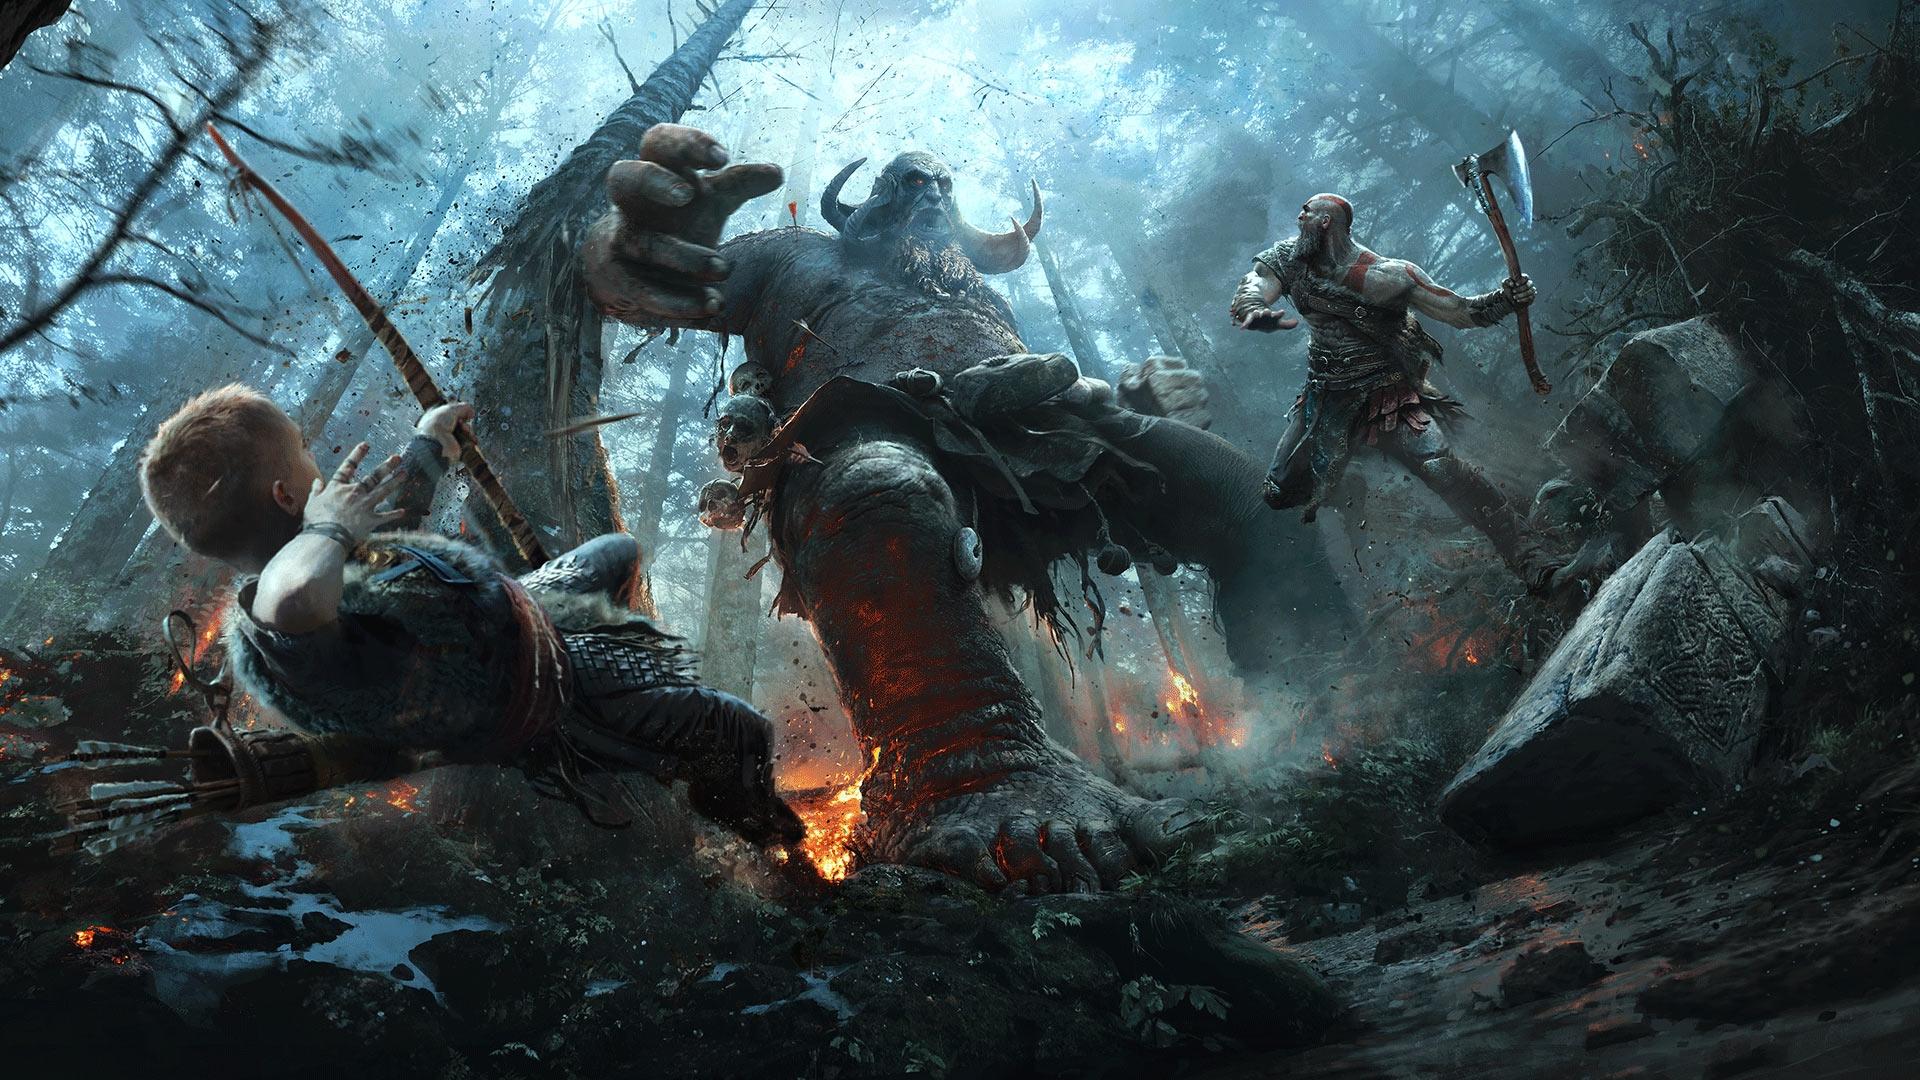 God Of War 4, Atreus, Kratos, Monsters, Artwork - God Of War 2018 -  1920x1080 Wallpaper - teahub.io